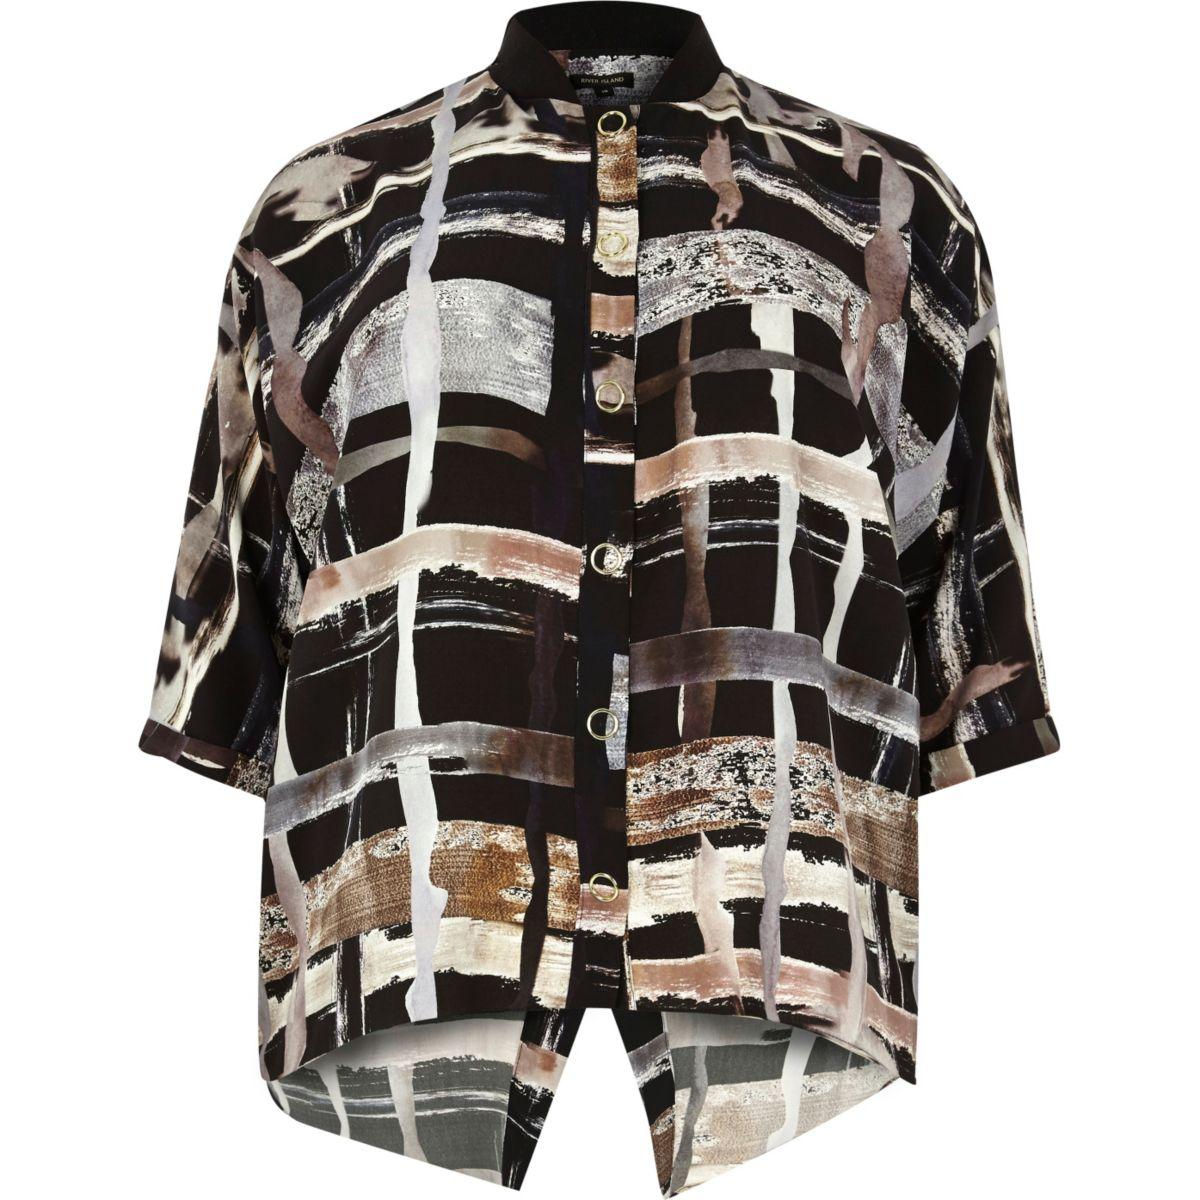 Plus brown print shirt